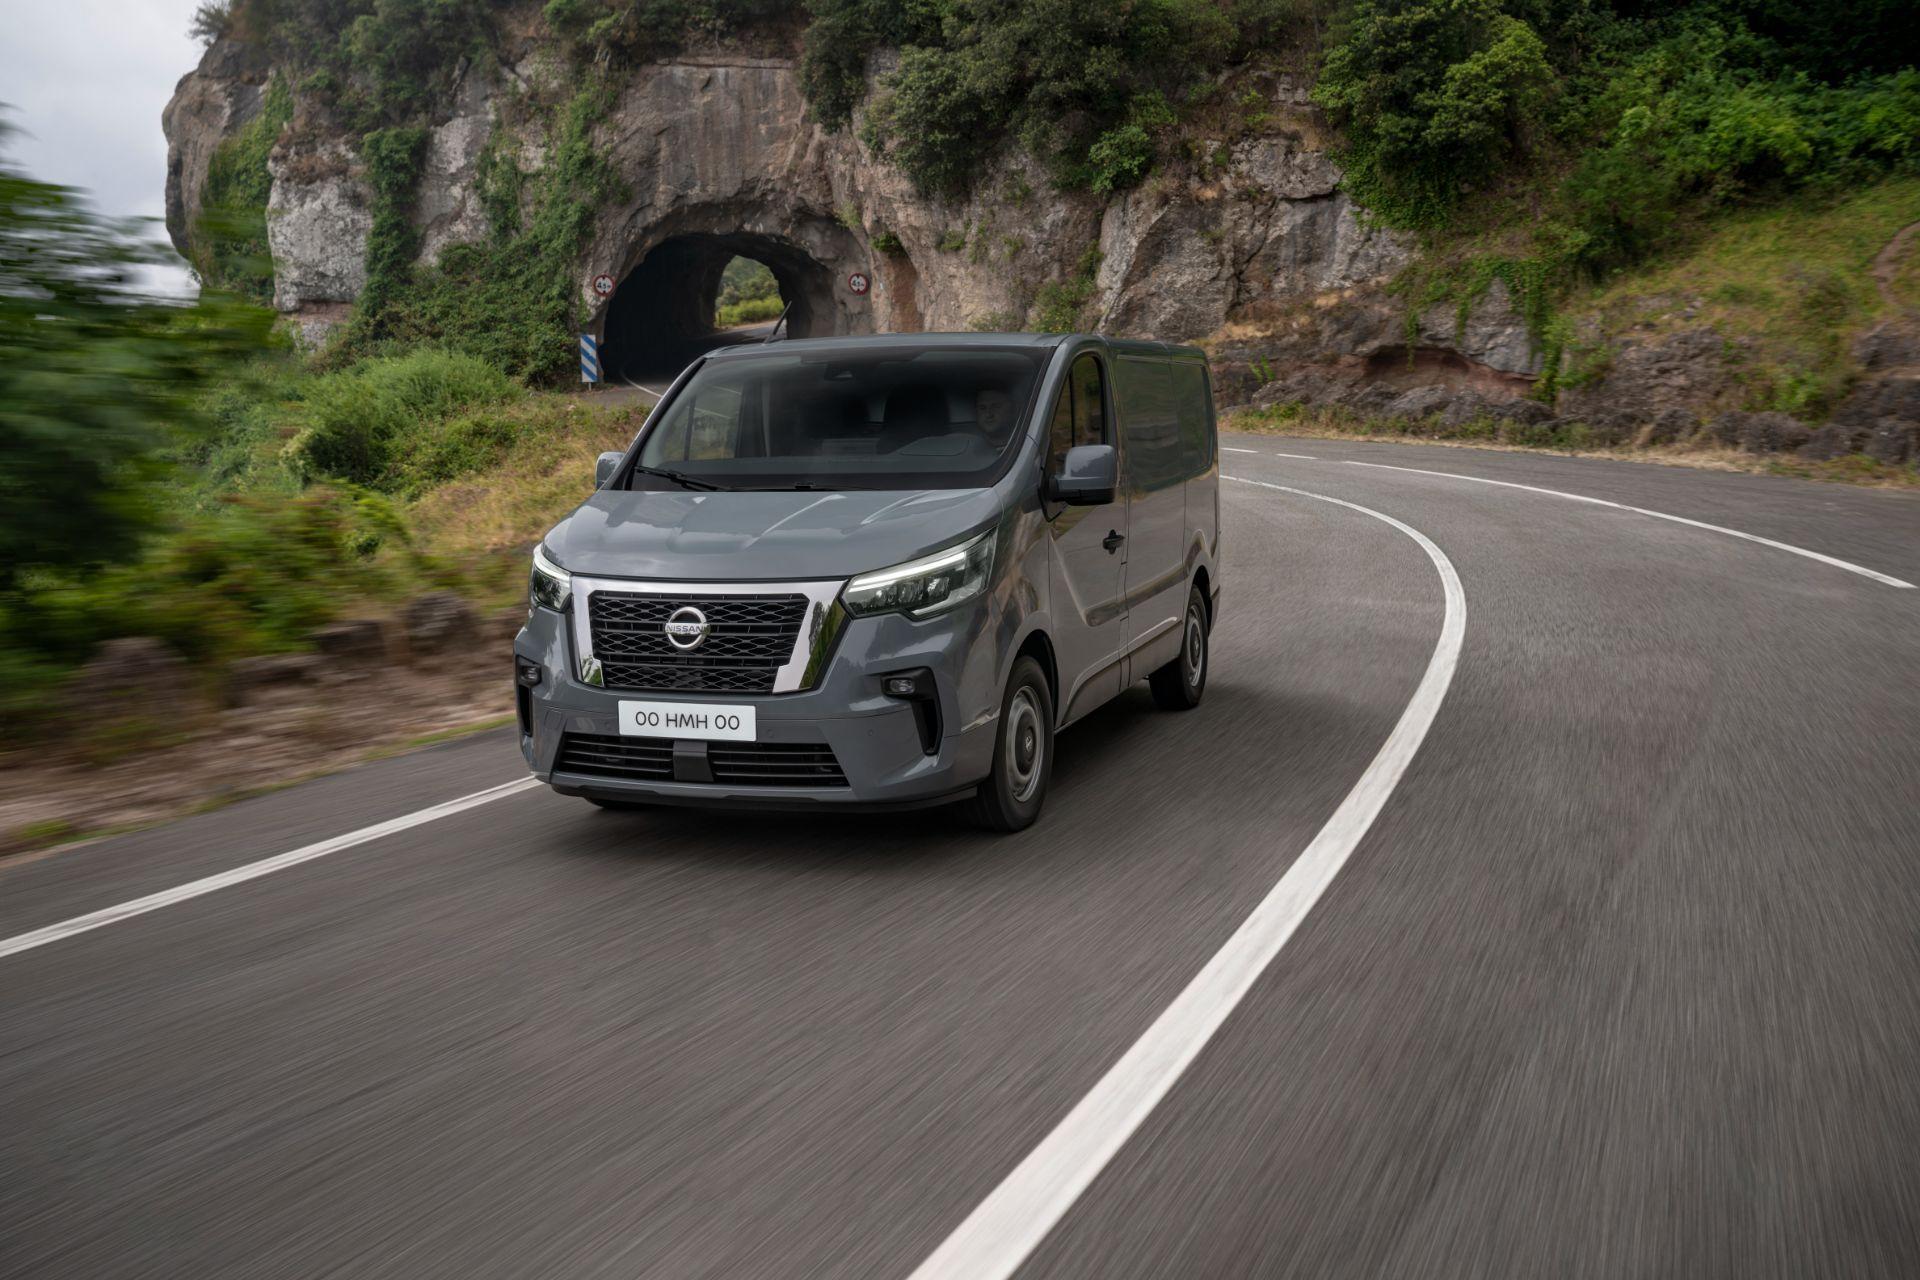 2022-Nissan-Primastar-van-2-1